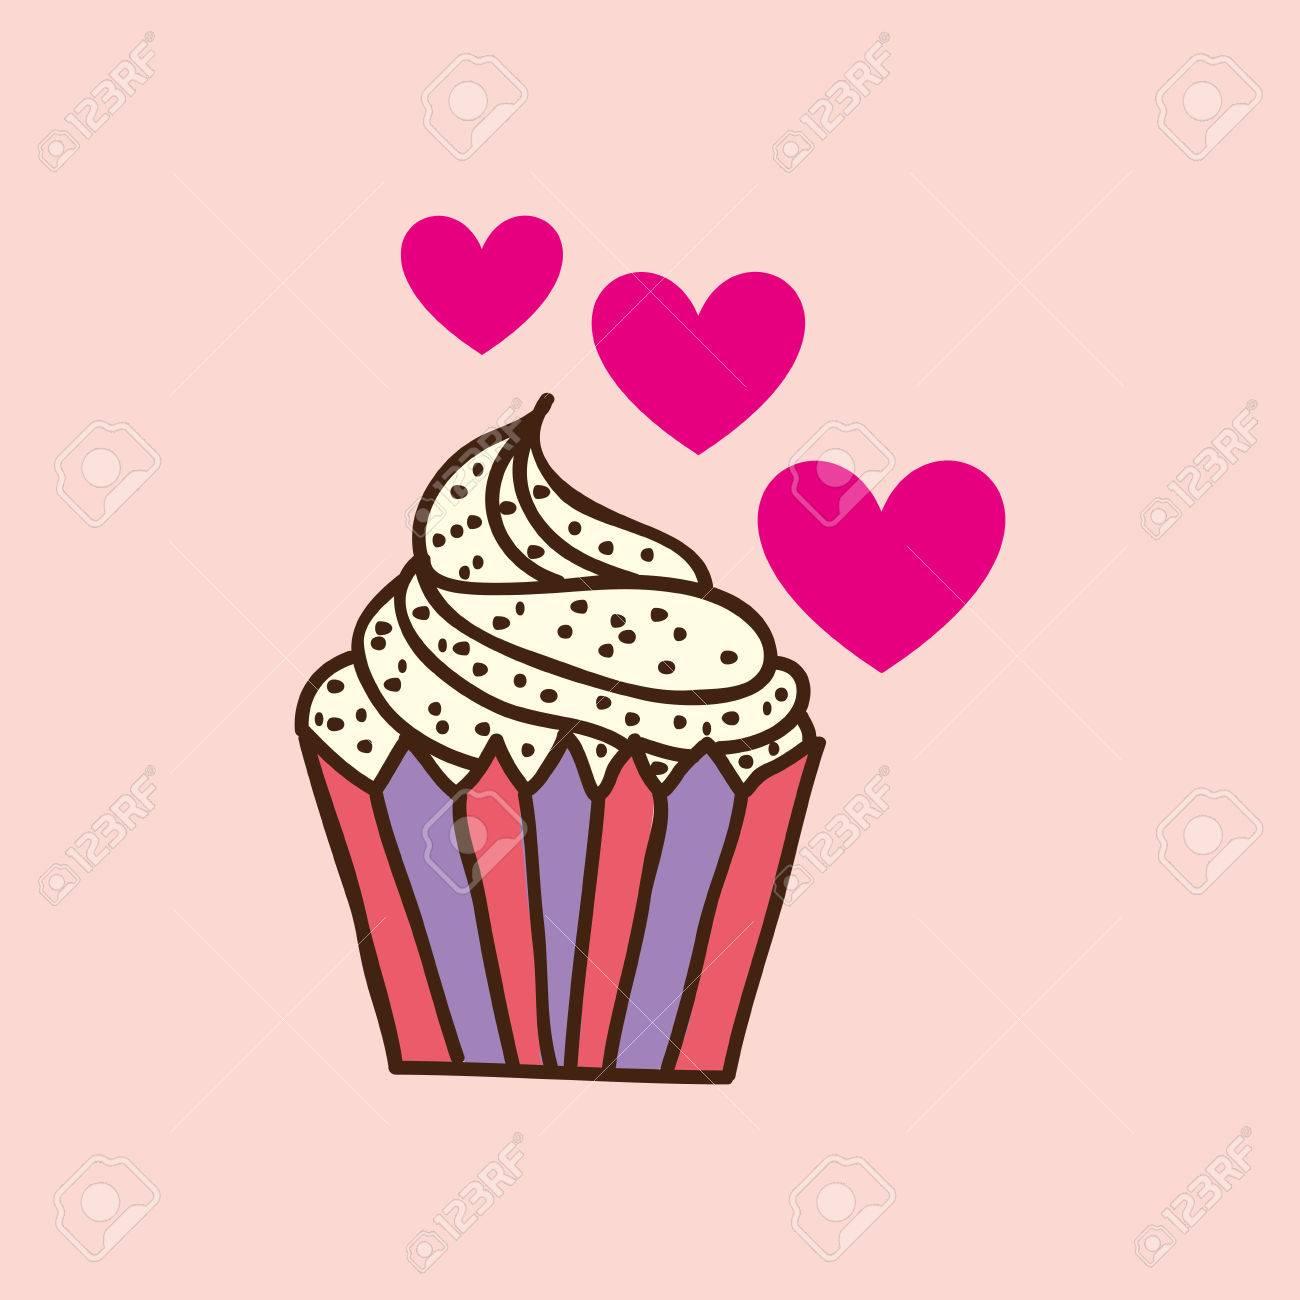 Cupcake De Coeur Rose Dessin Anime Chips Icone Illustration